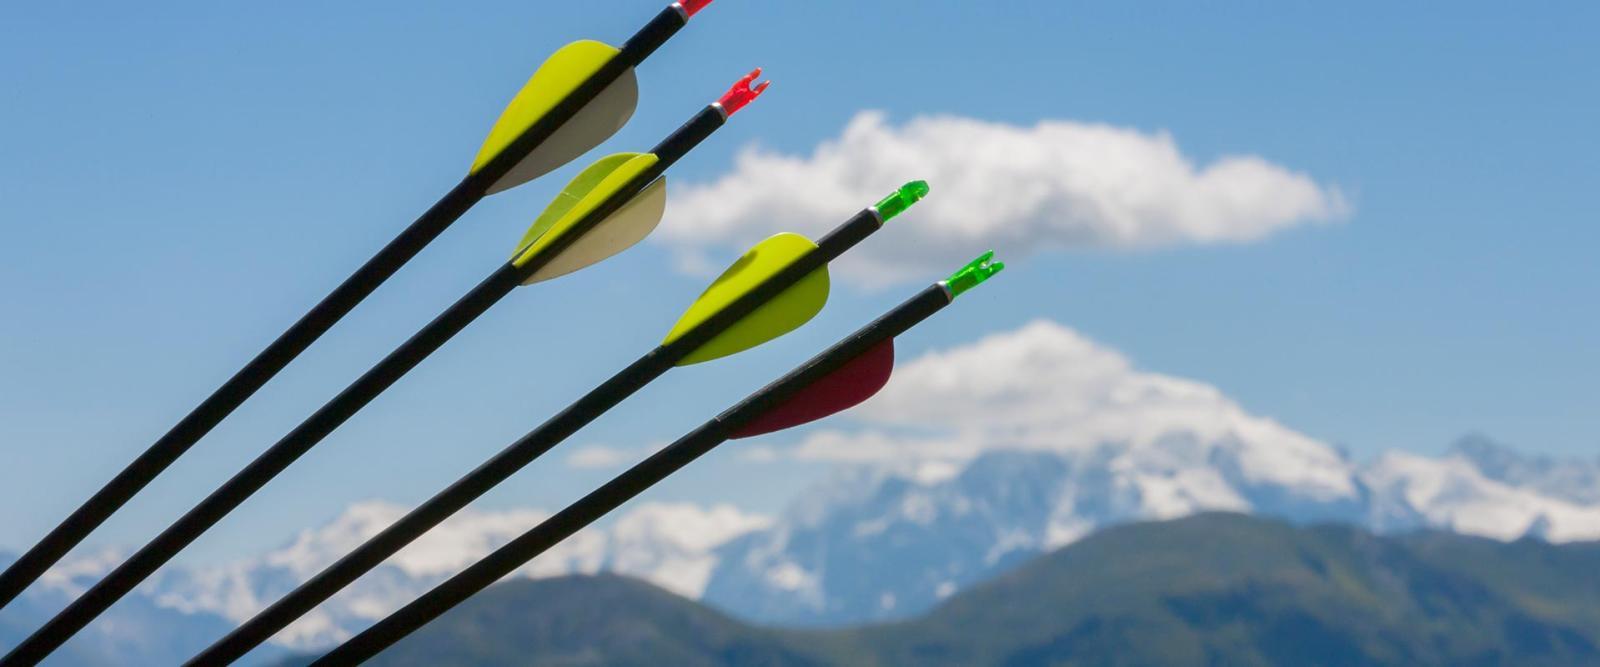 Bogenschießen Südtirol: Bogensport Hotel Am Erlebnisberg